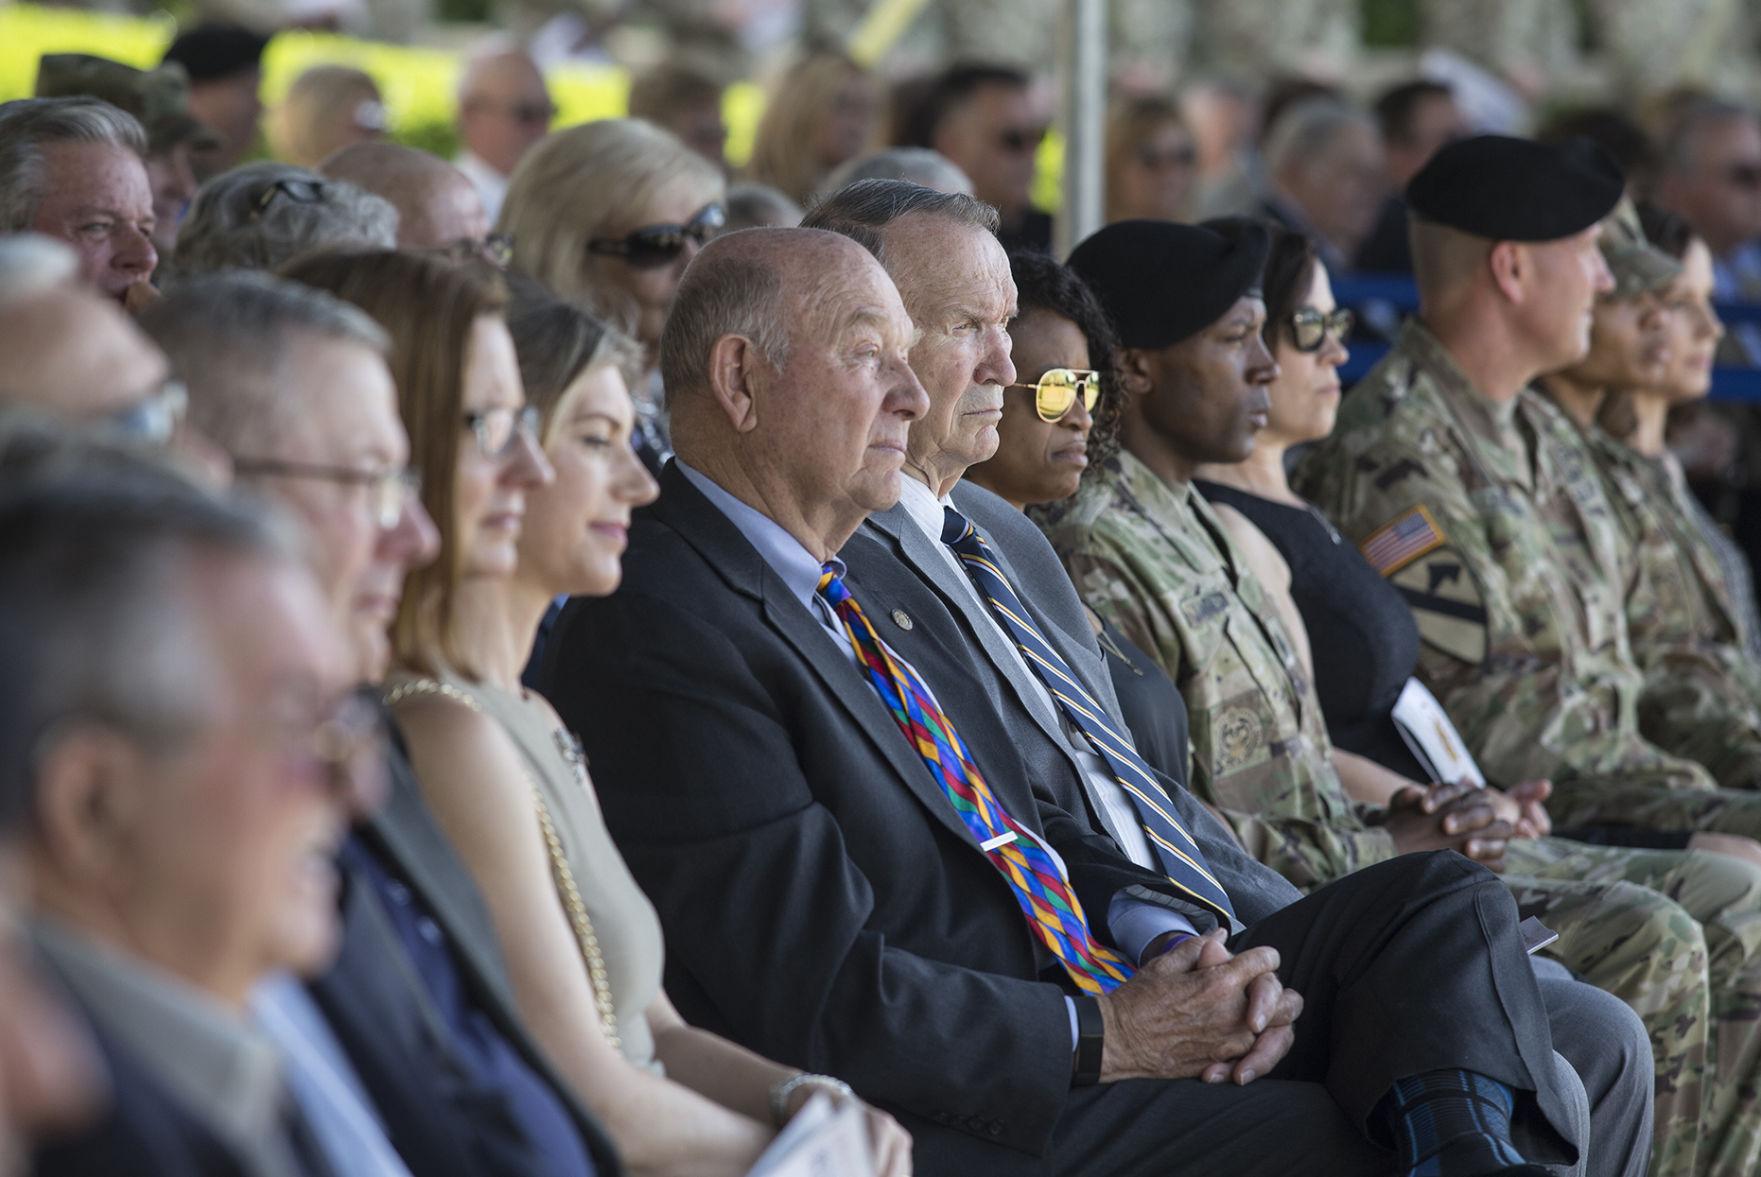 III Corps celebrates 100th anniversary